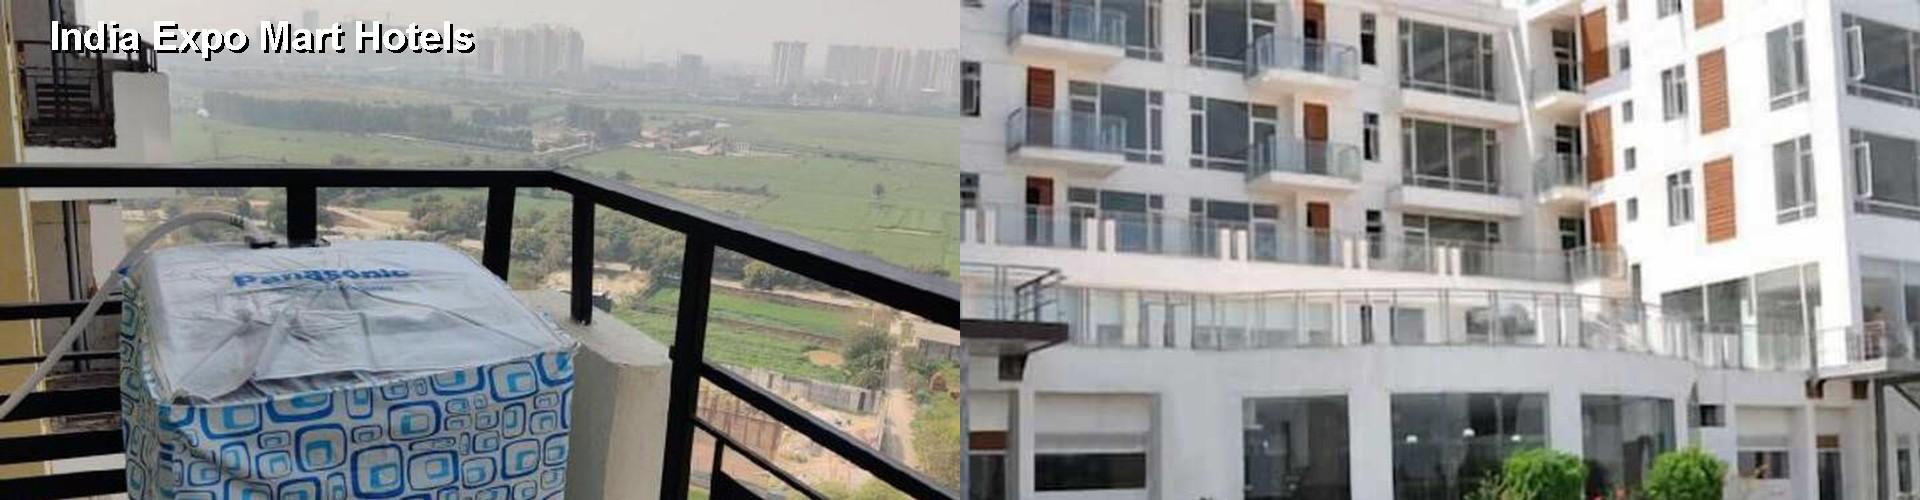 5 Best Hotels Near India Expo Mart